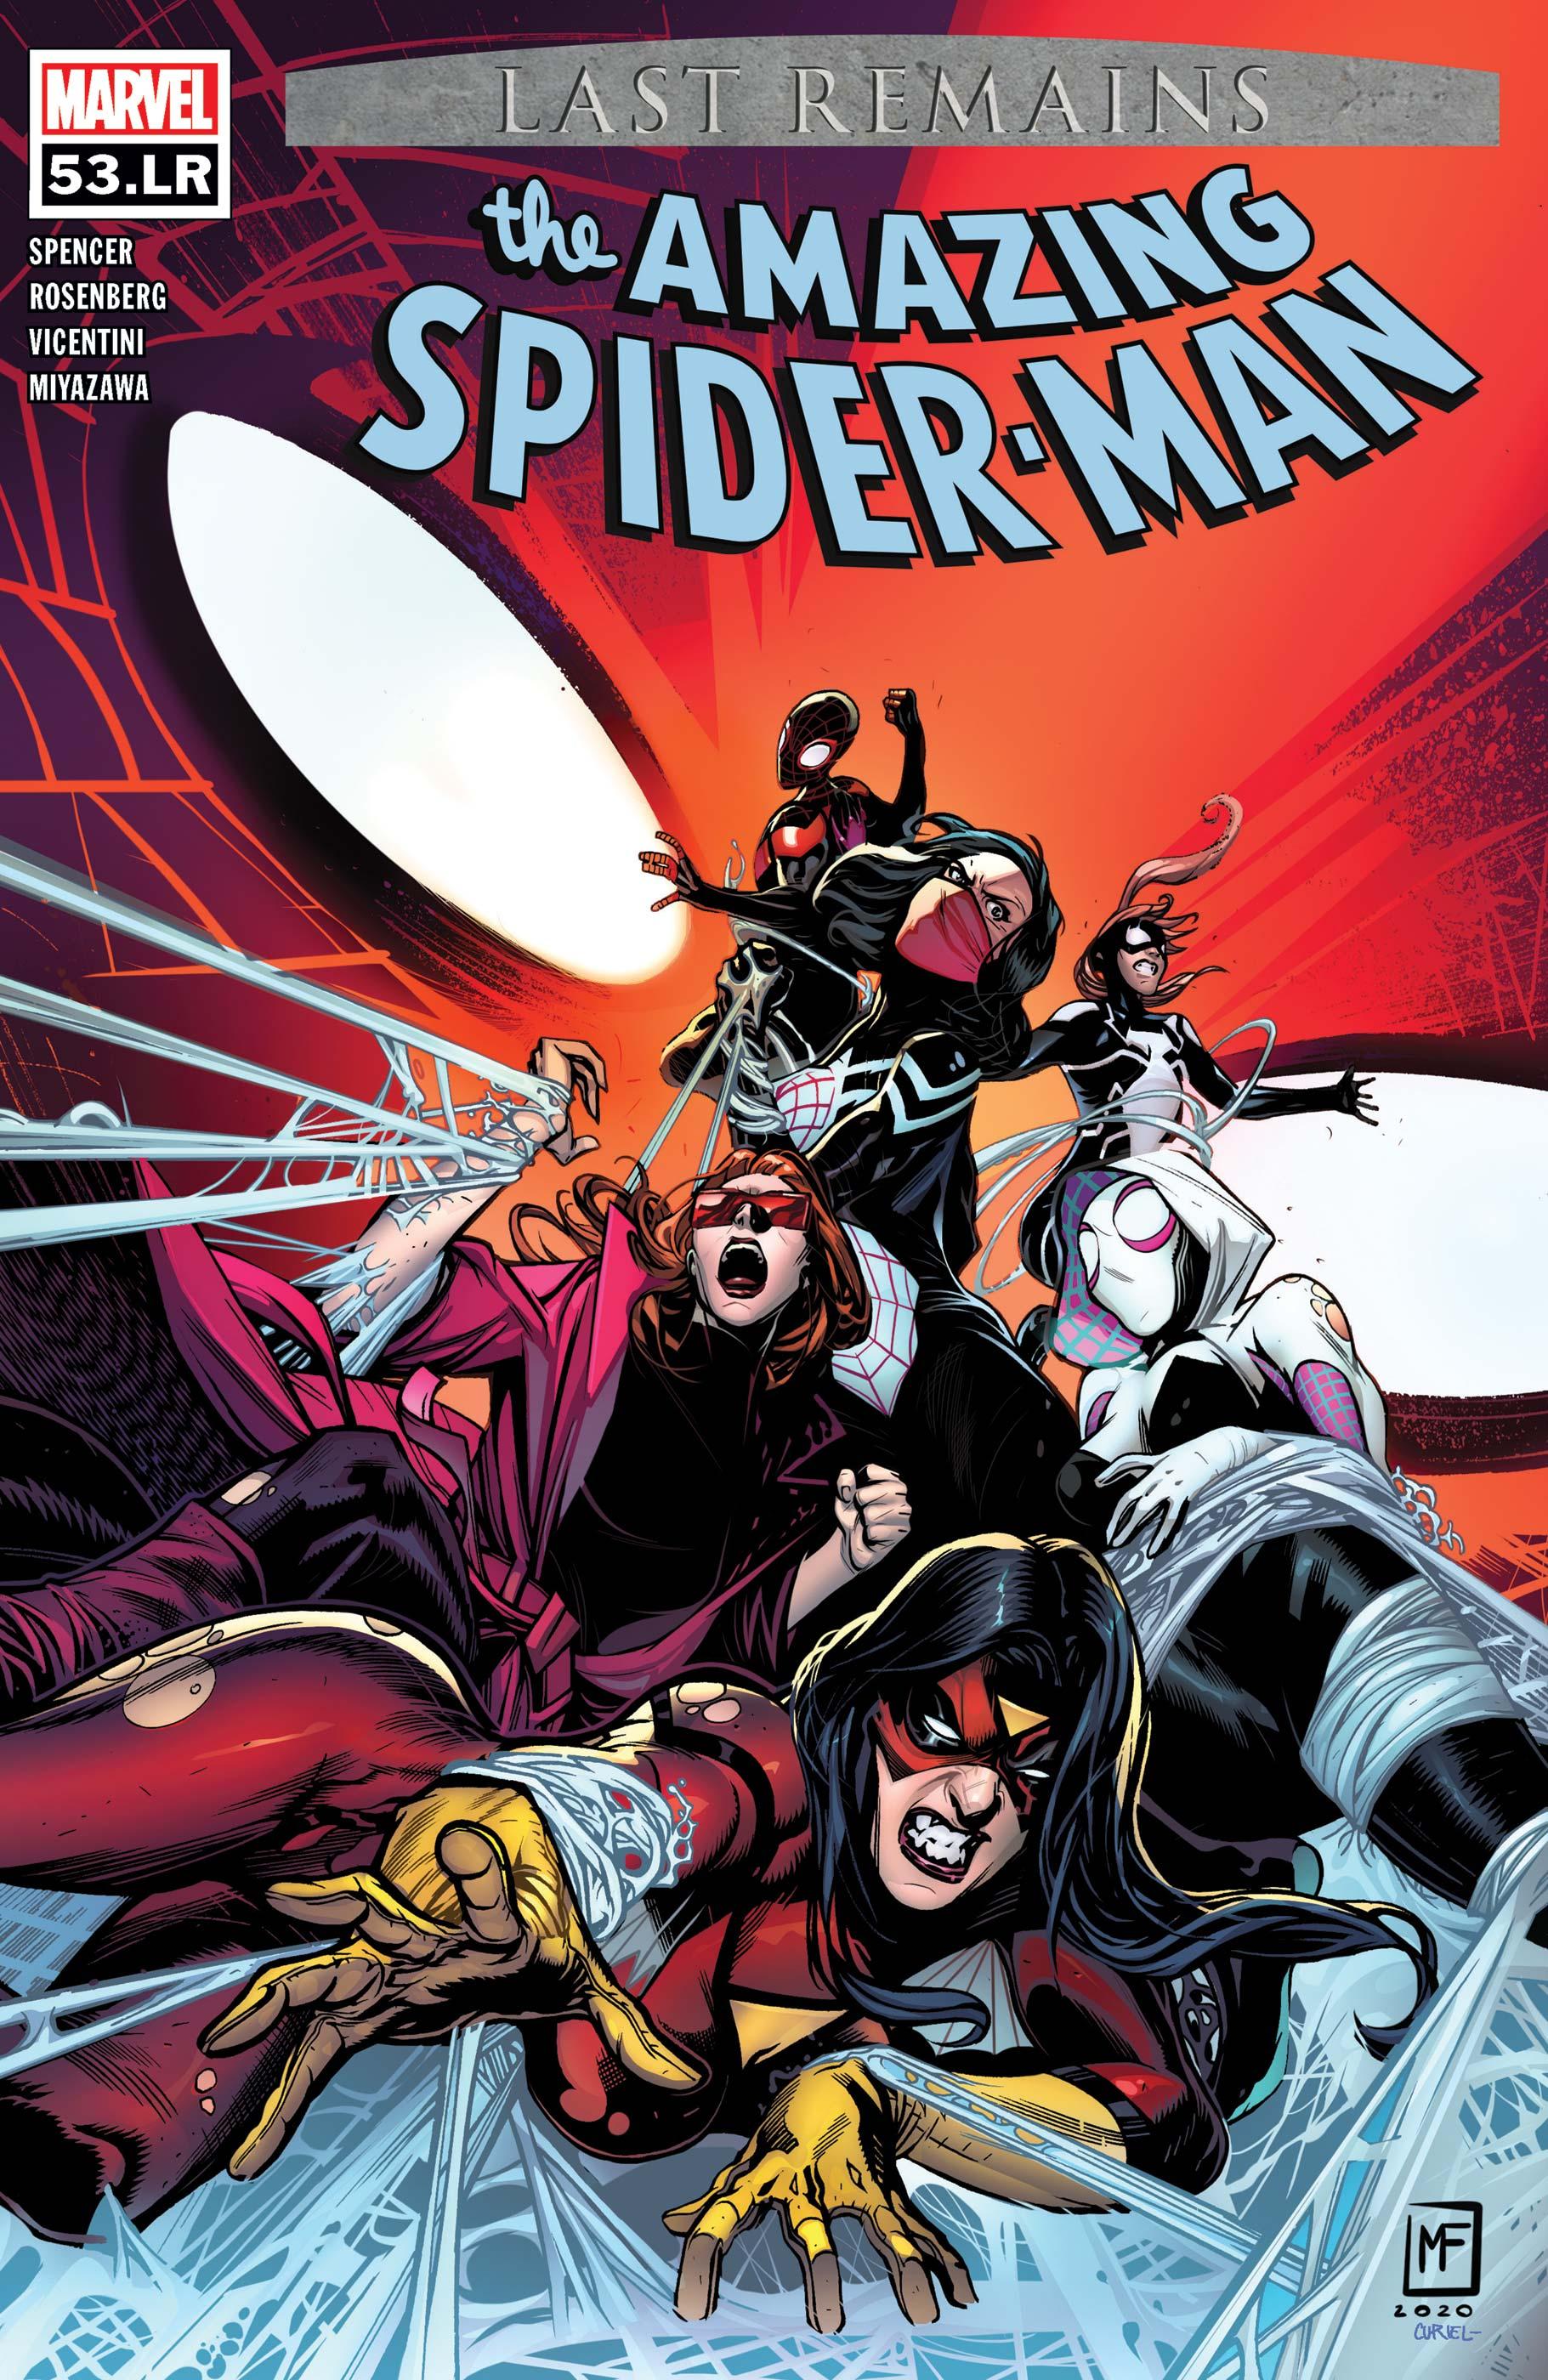 The Amazing Spider-Man (2018) #53.1